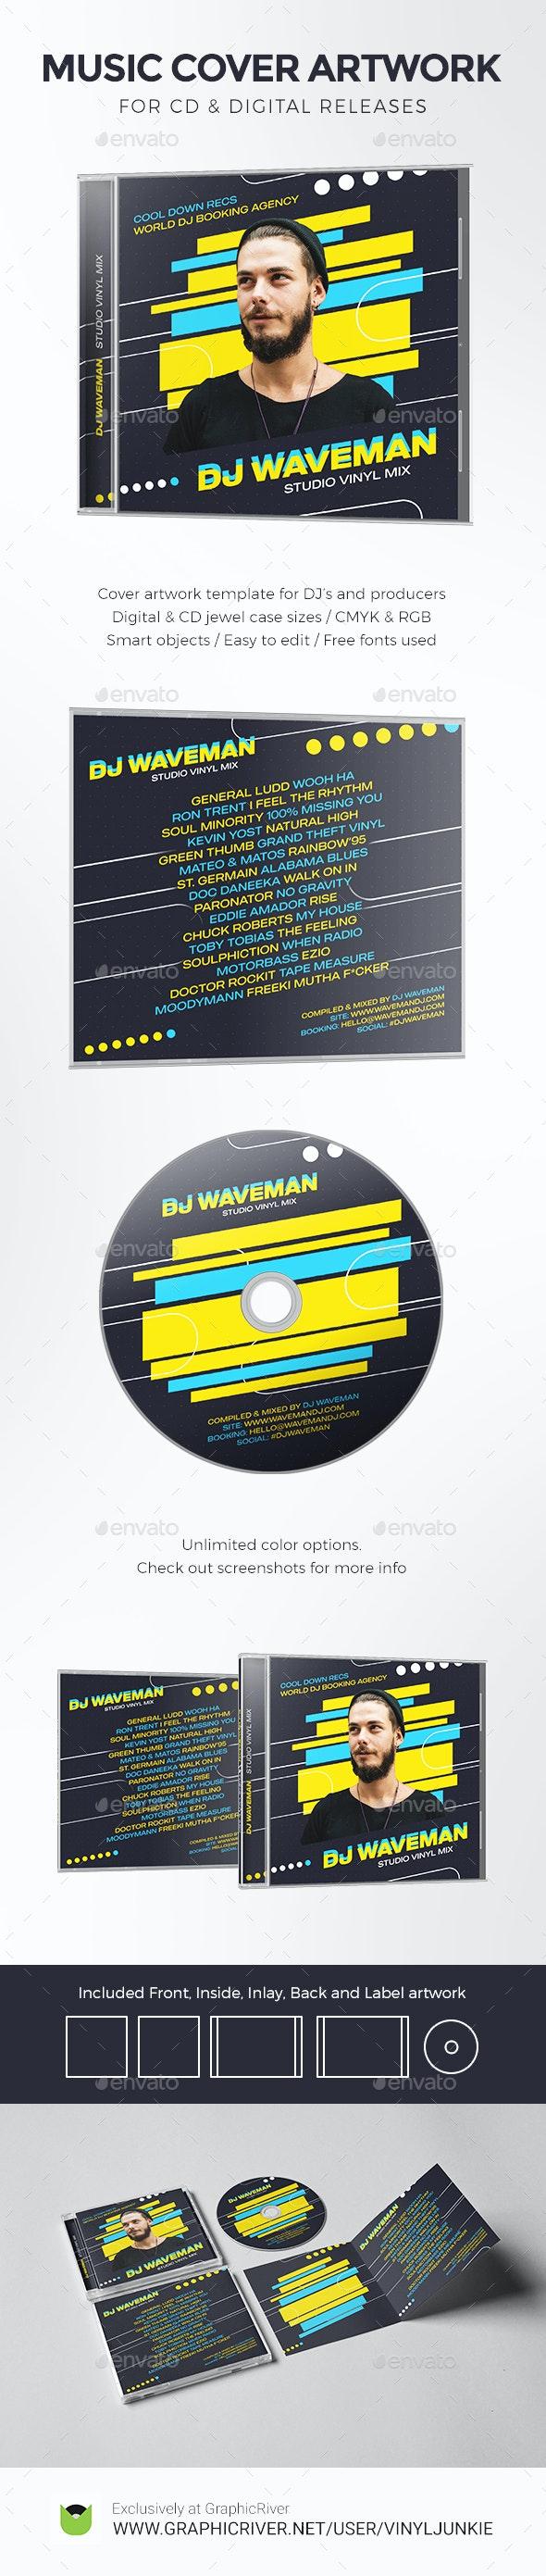 DJ Music Cover Artwork Template for CD / Digital Releases - CD & DVD Artwork Print Templates